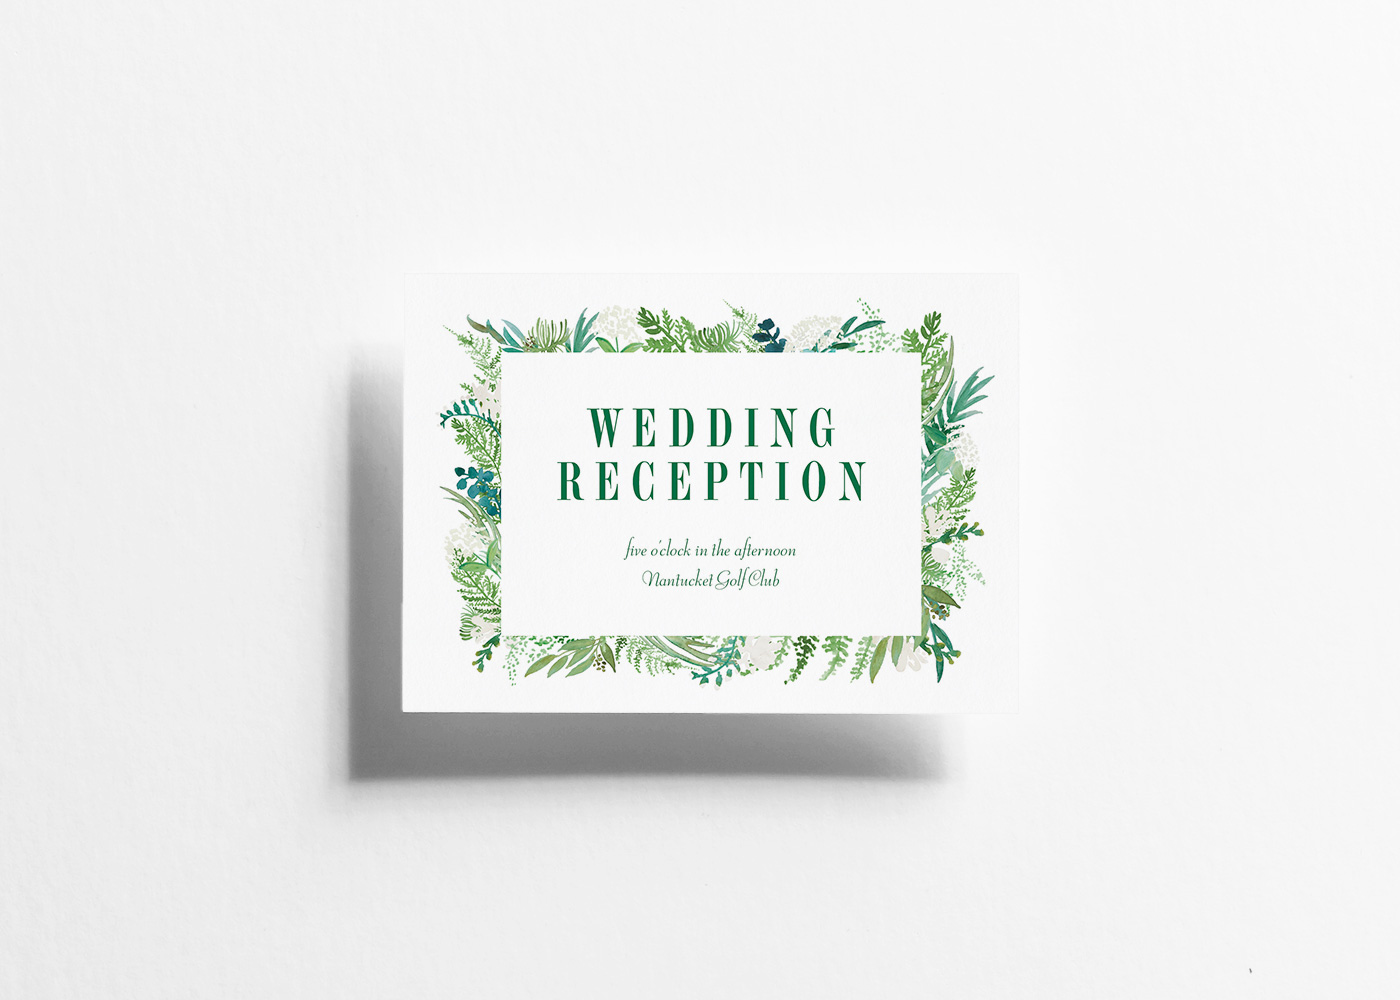 LoveLore_SmallEnclosure_SP18_BotanicalBliss_Reception.jpg